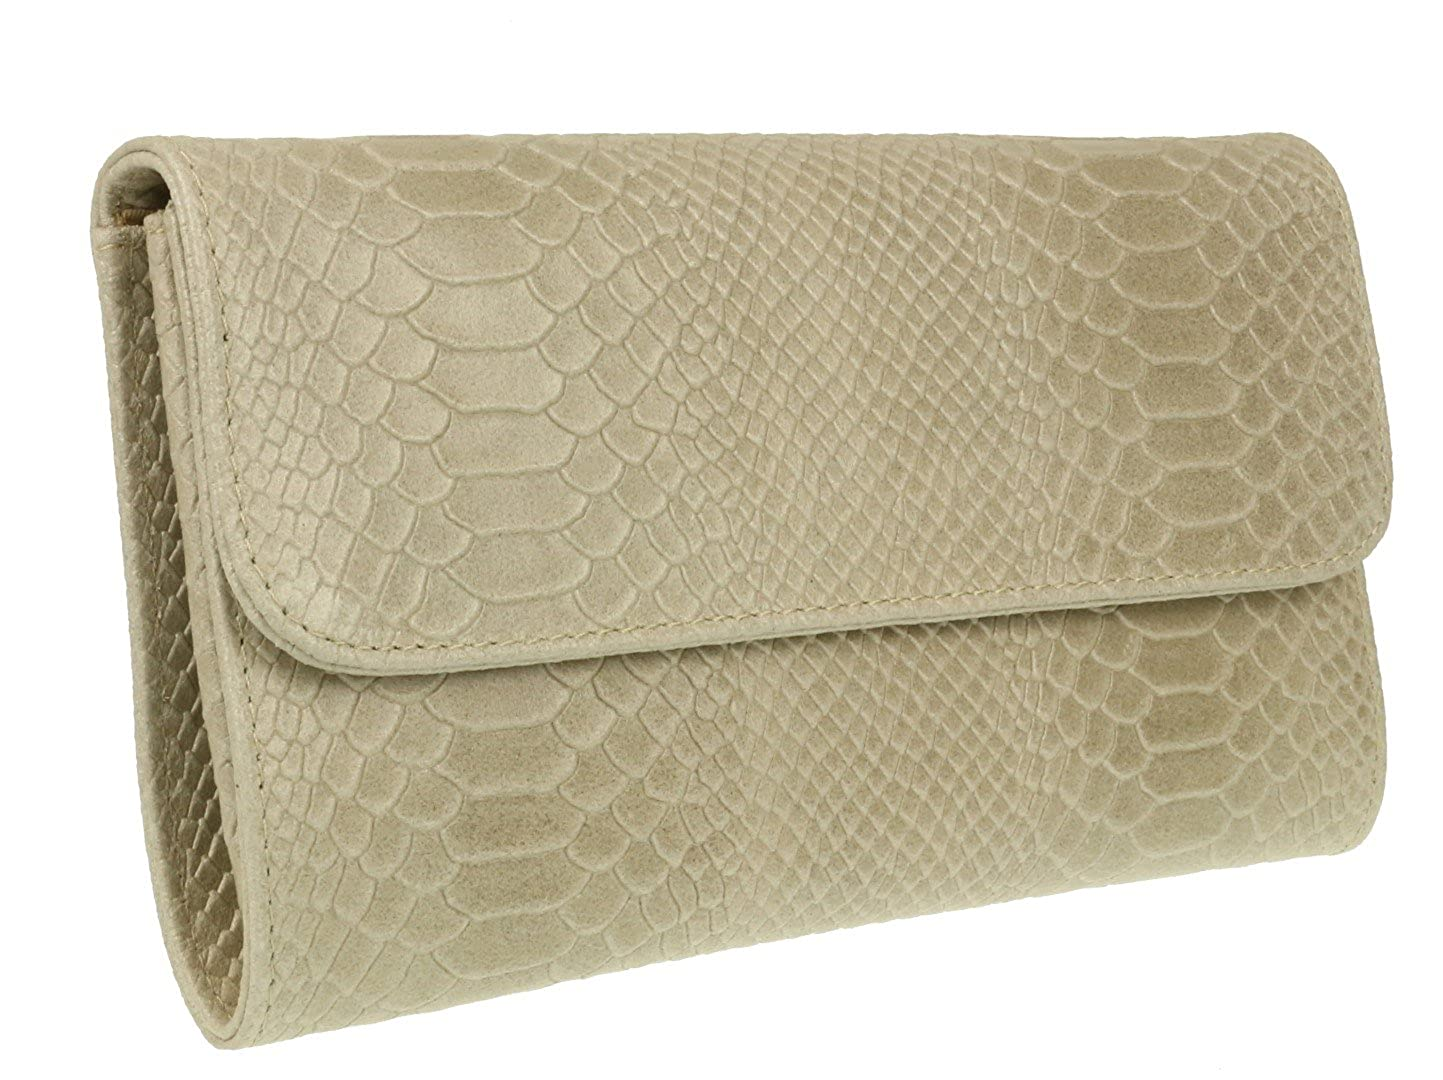 fcf59e4891 Girly HandBags Snake Print Suede Clutch Bag Italian Leather (Beige)   Amazon.co.uk  Shoes   Bags